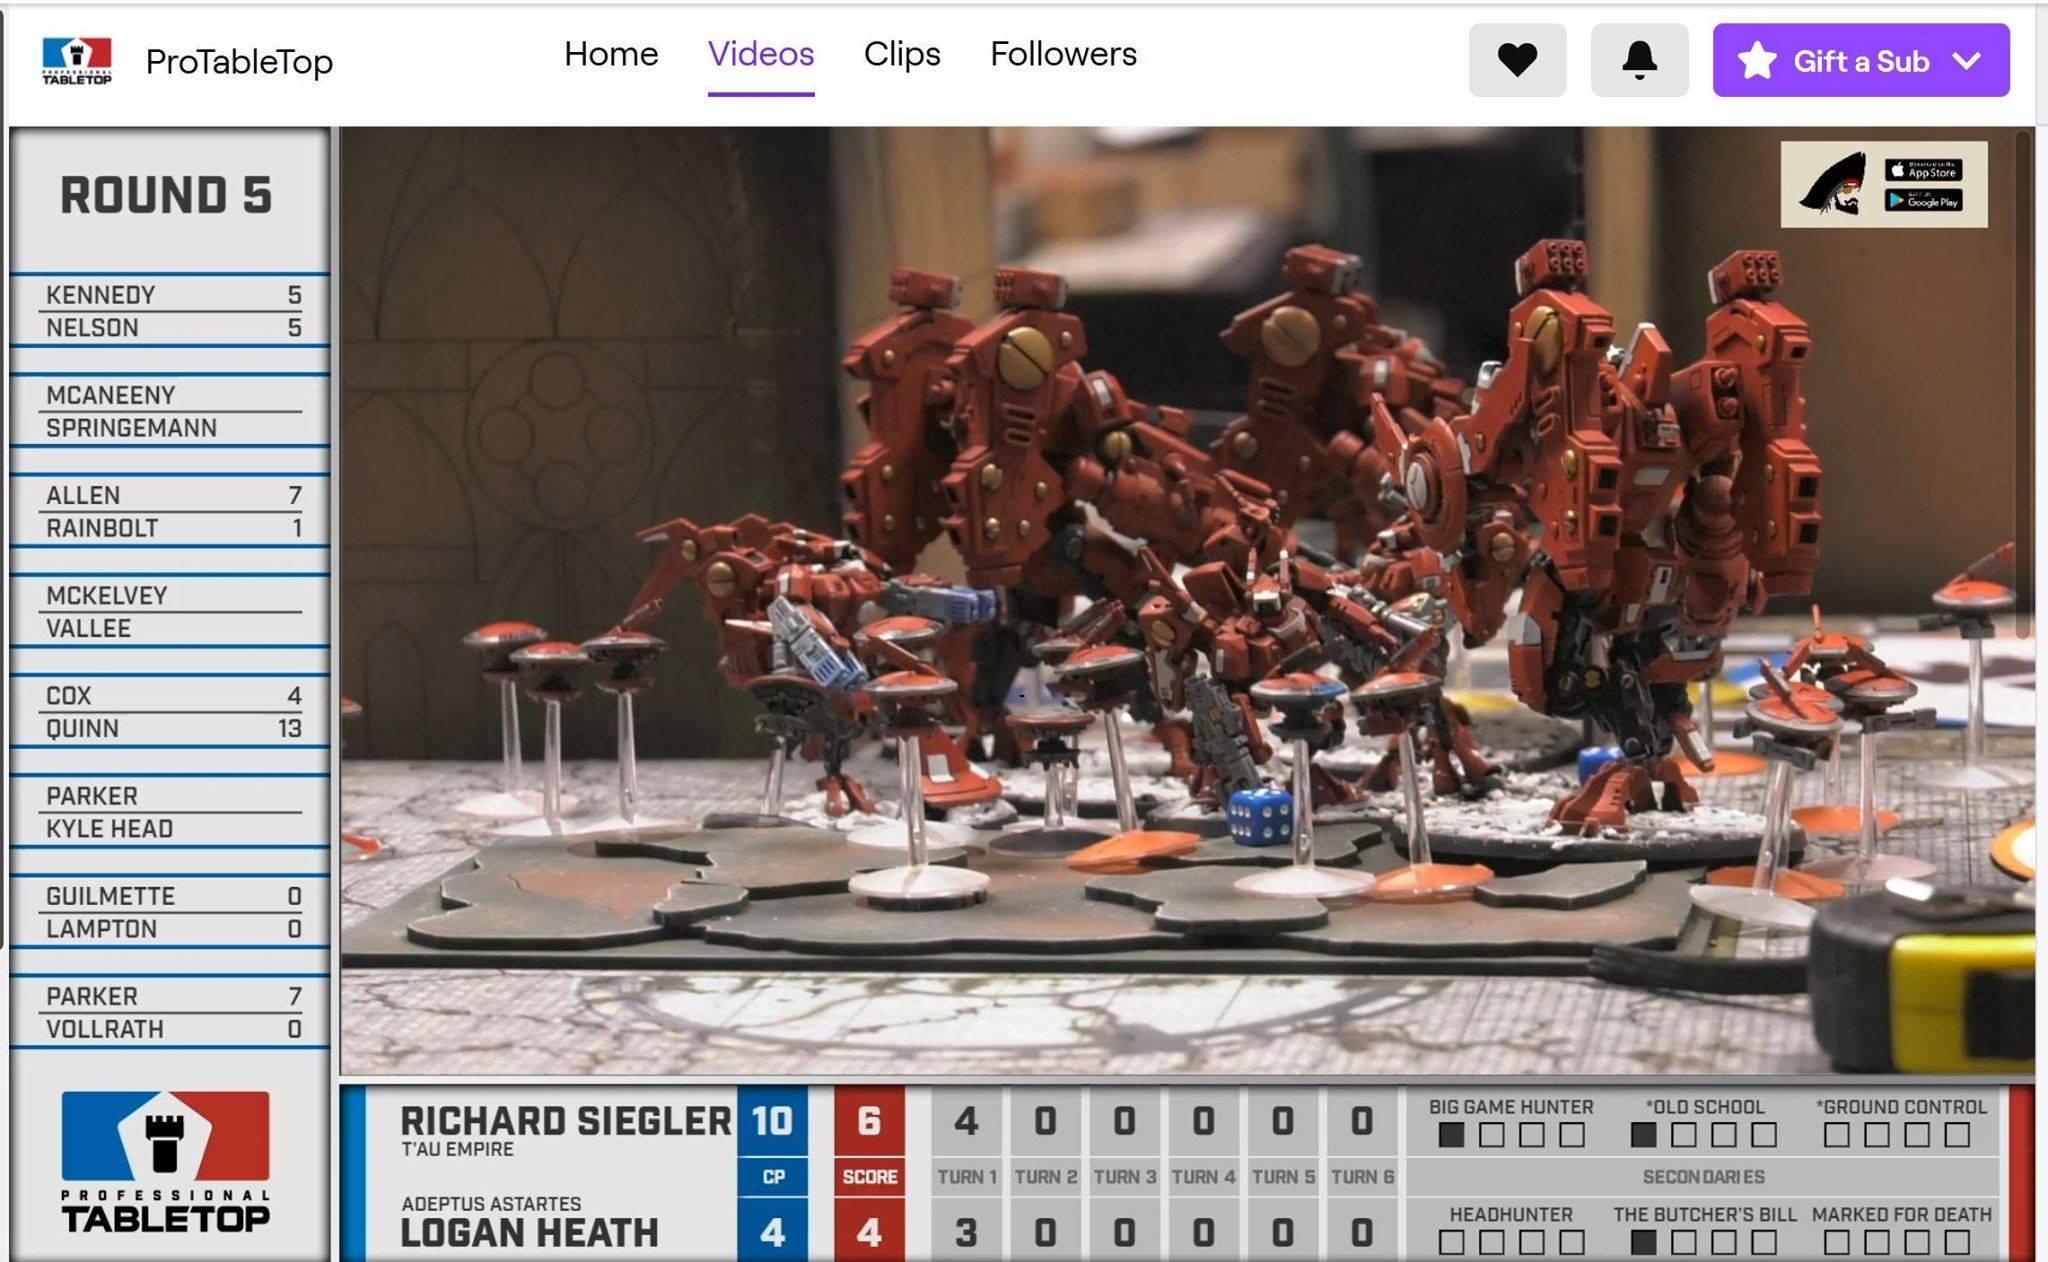 Tau T/'au xv104 Riptide Battlesuit Farsight Enclaves Warhammer 40K Kill Team NOS